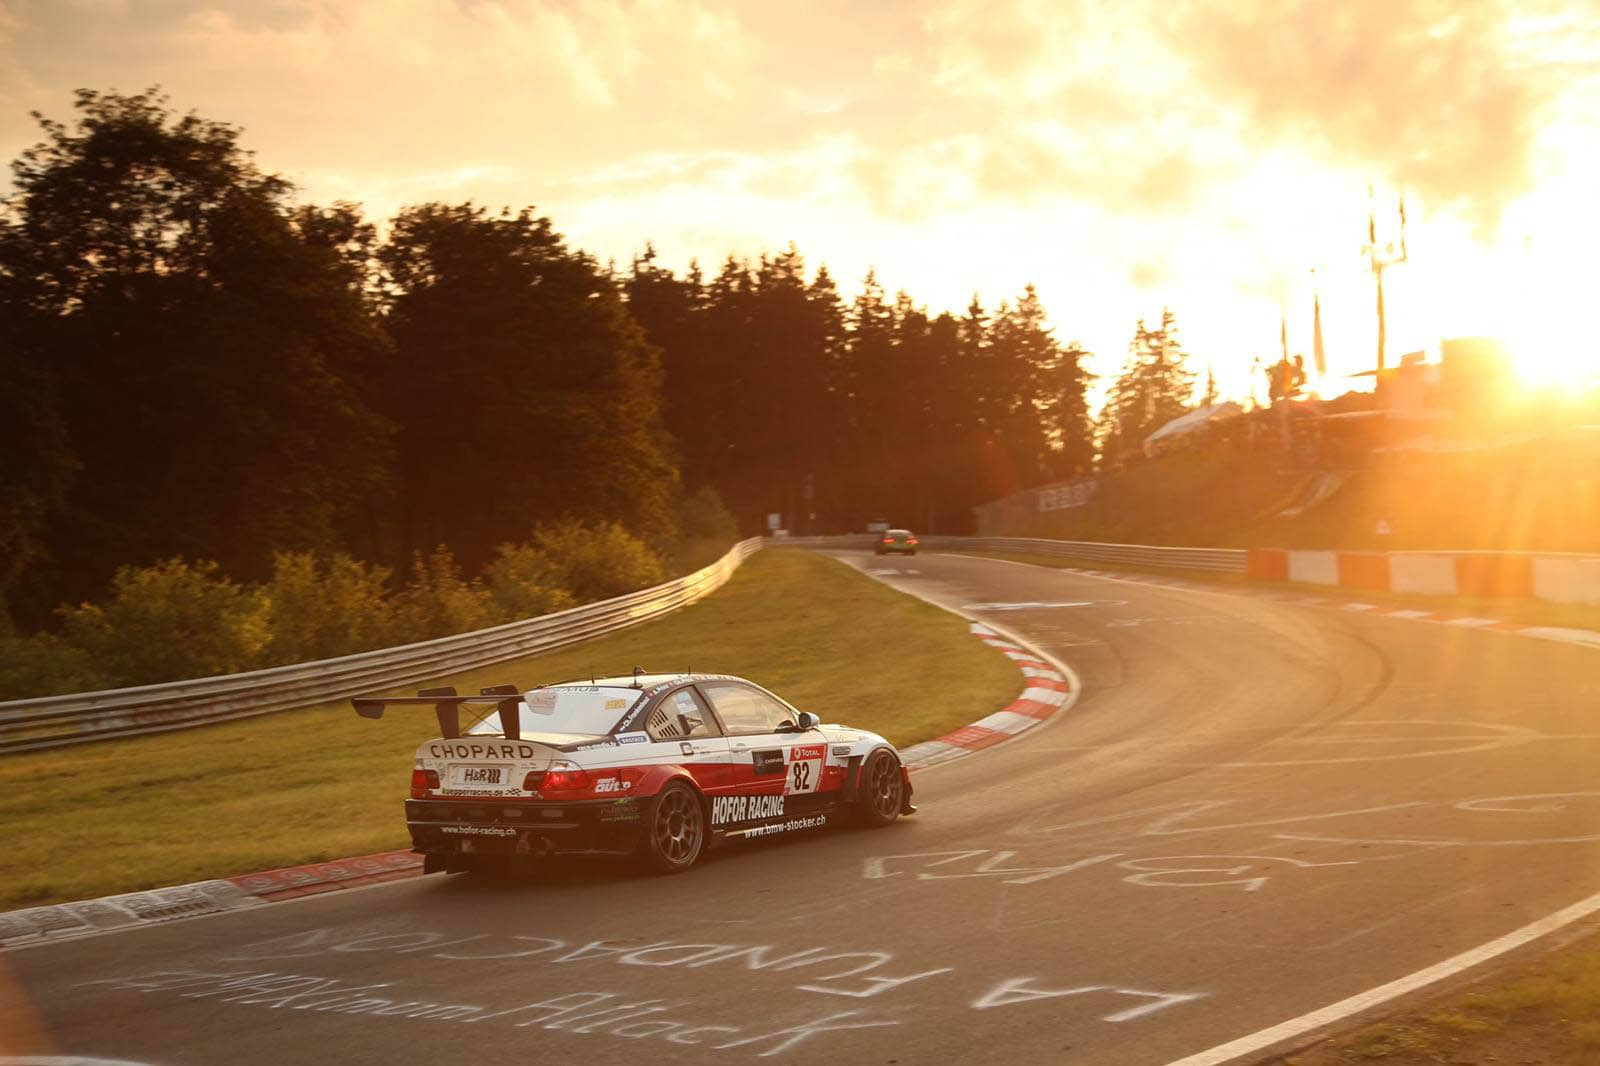 IMG 1959 - 21.-23. Juni 2019 – ADAC TOTAL 24h Rennen – Nürburgring / DE